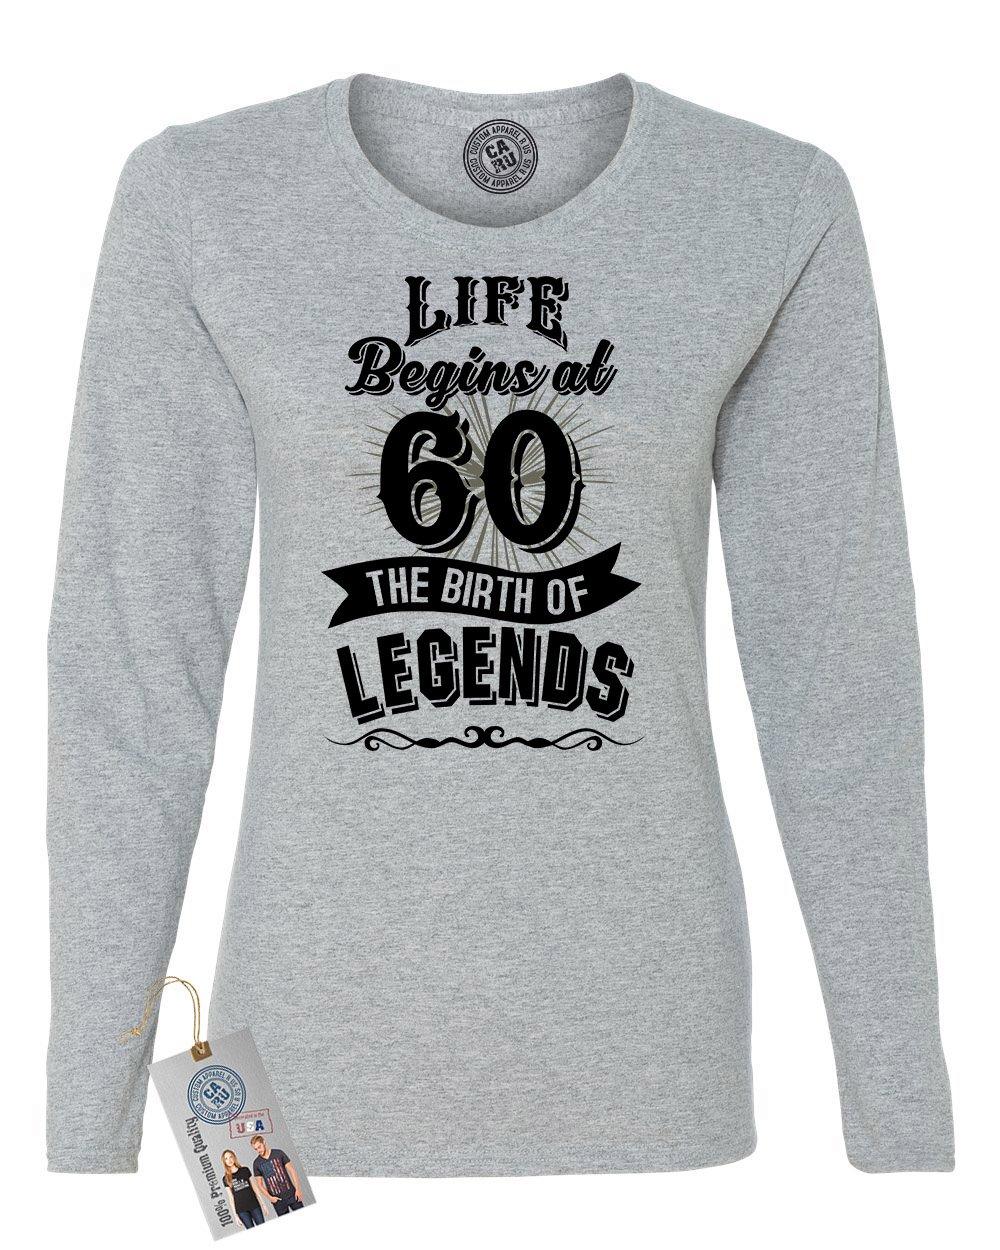 Custom Apparel R Us Life Begins At 60 Legends Birthday Gift T Shirt 6324